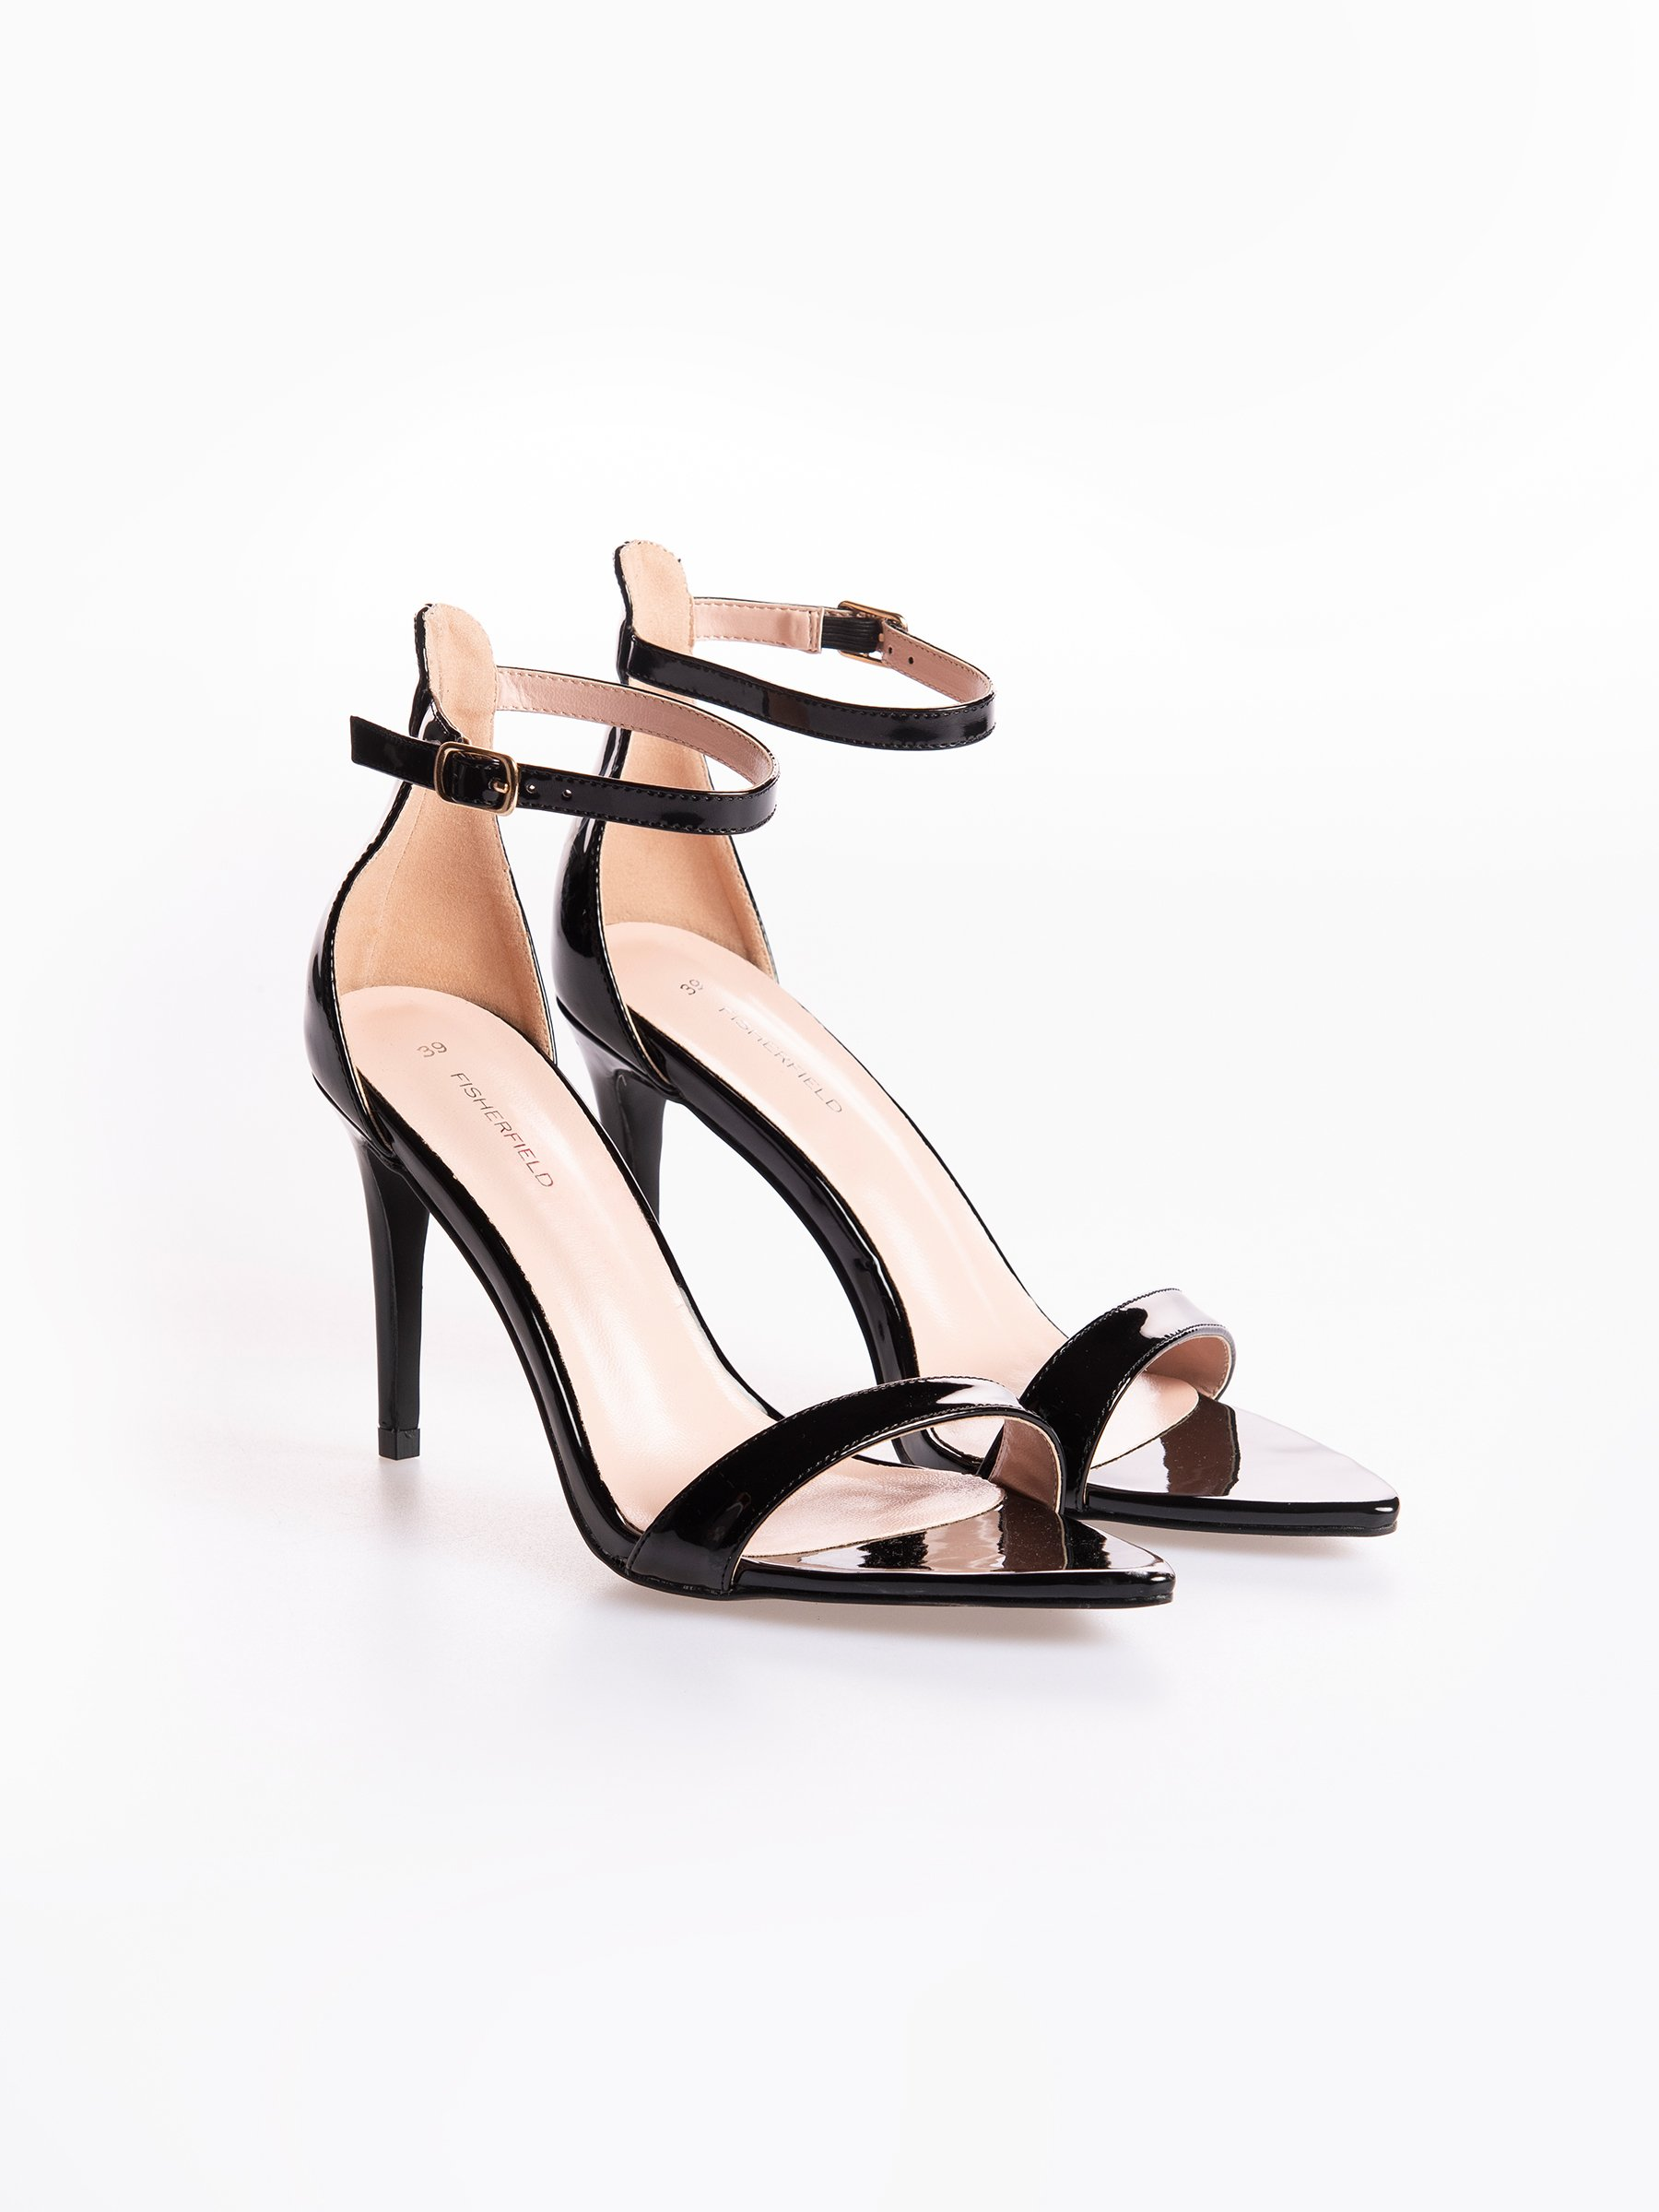 High heel sandals | GATE